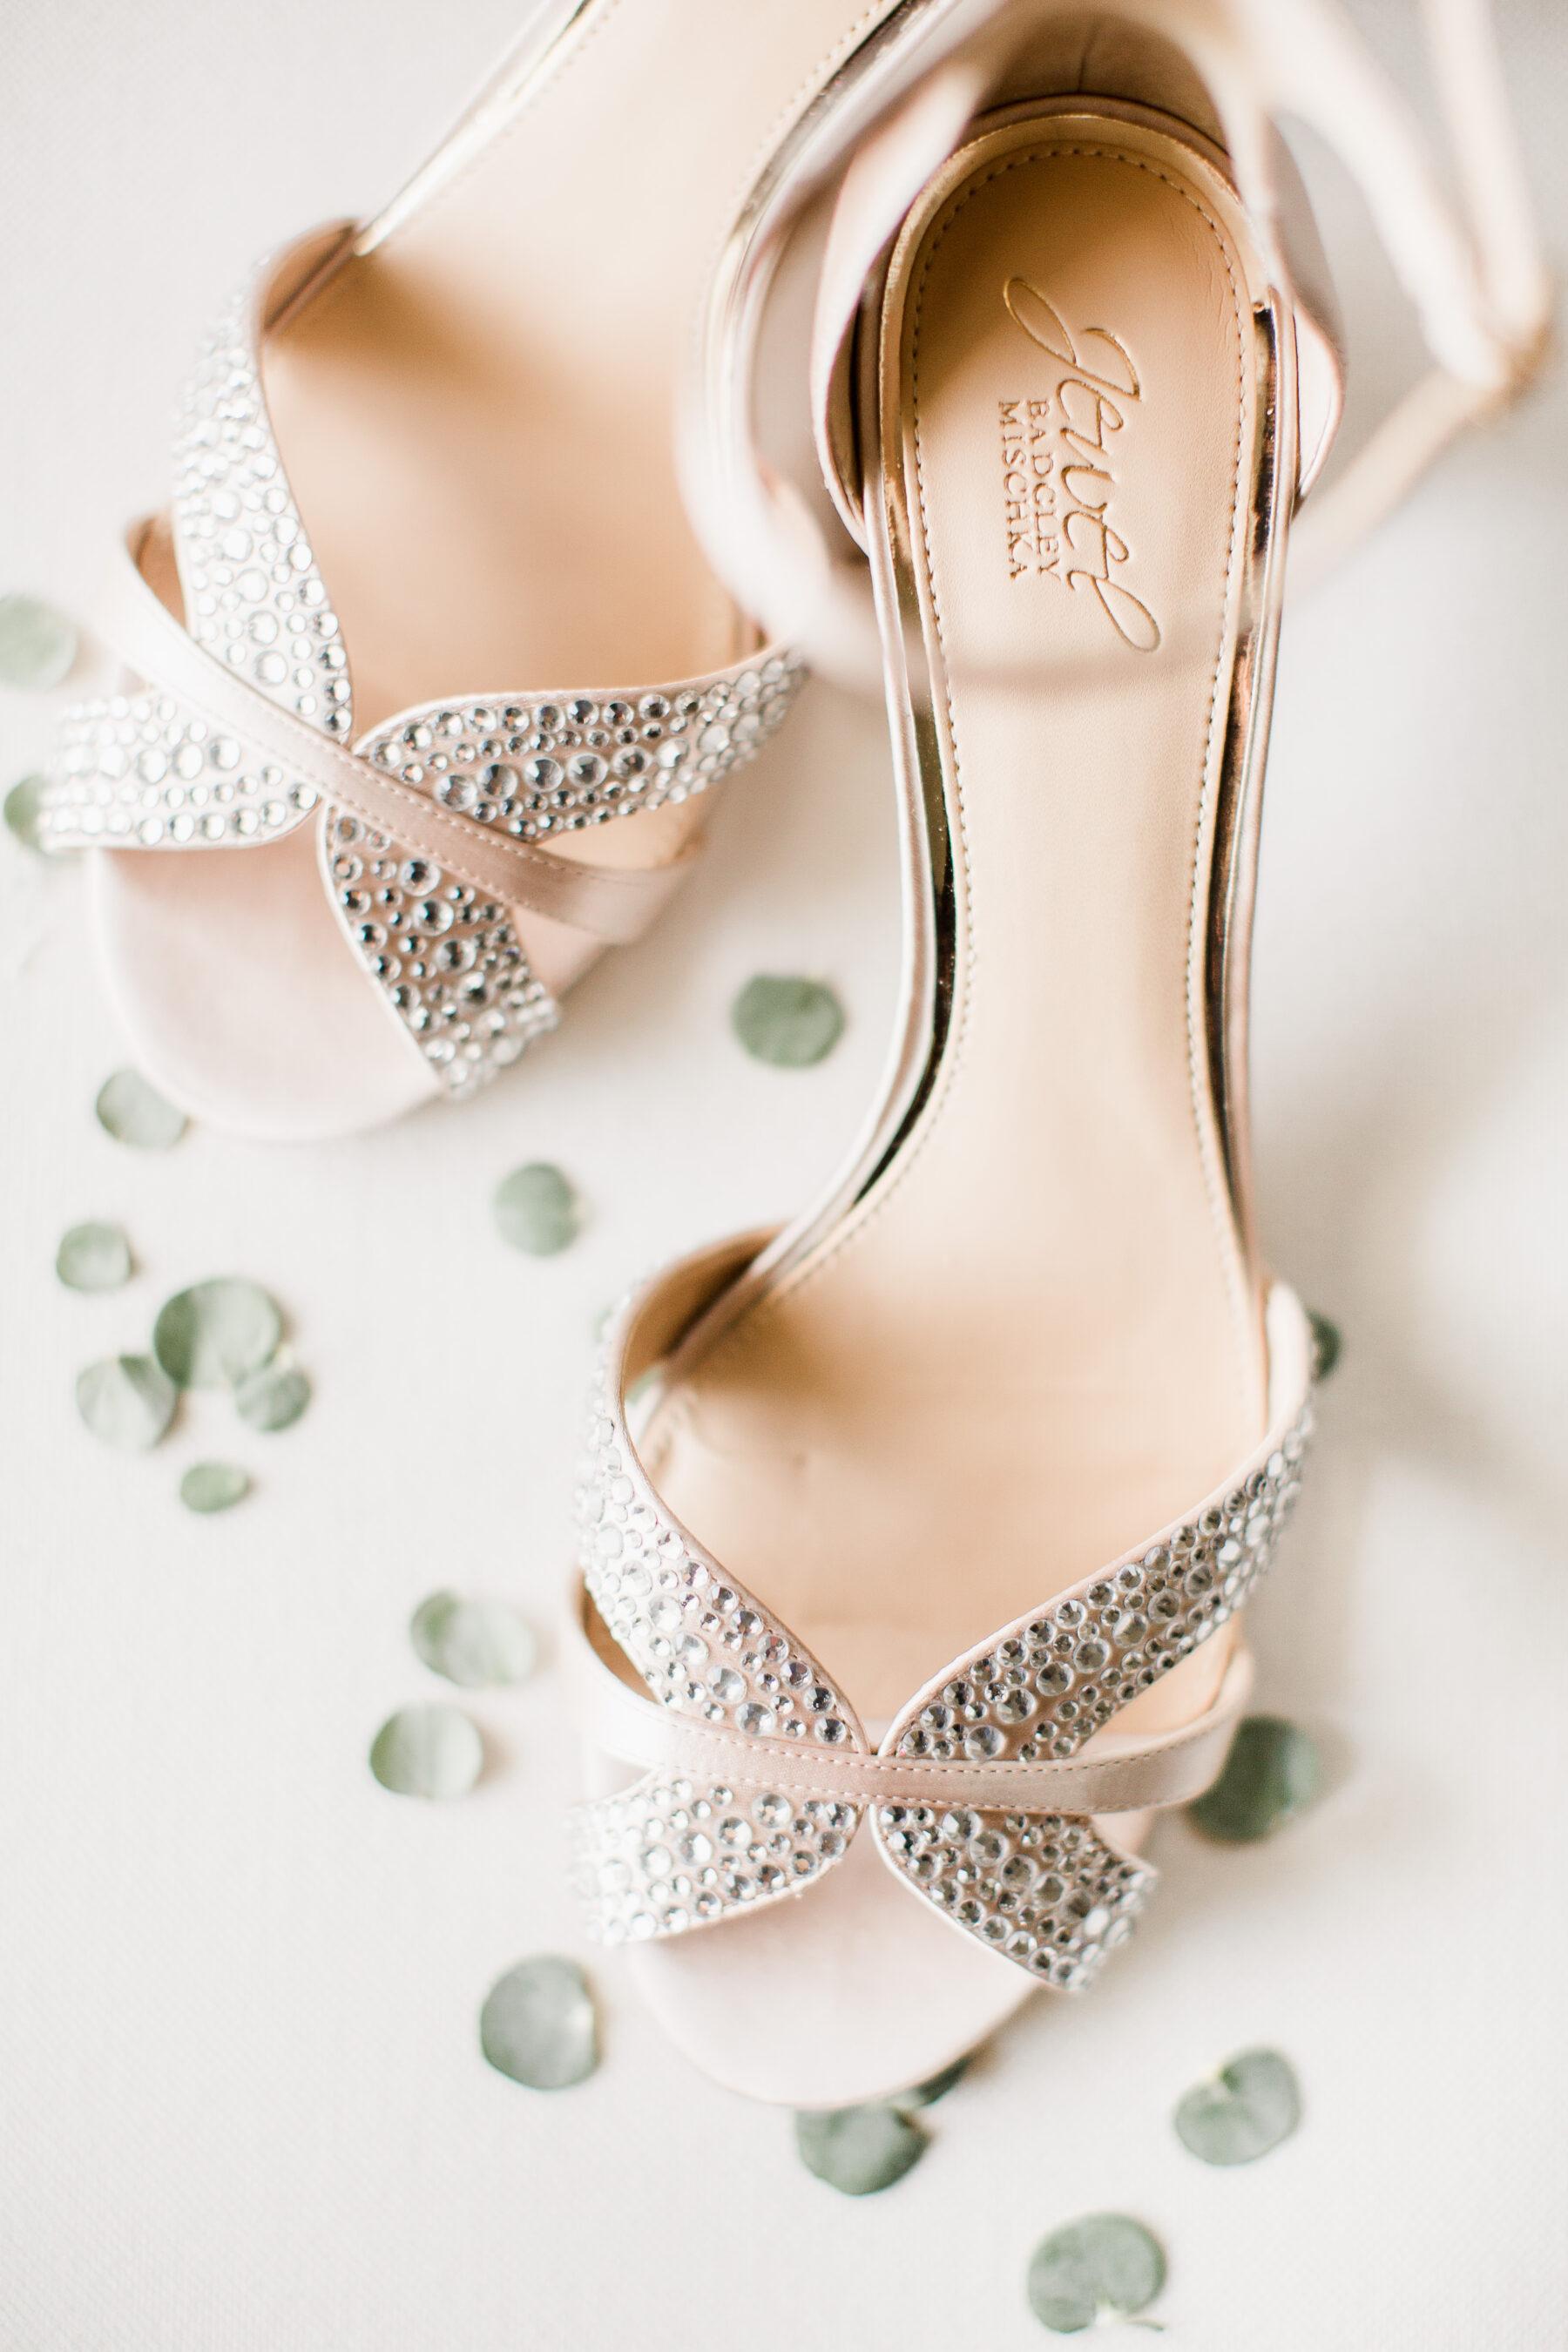 Jewel Badgley Mischka wedding shoes | Nashville Bride Guide